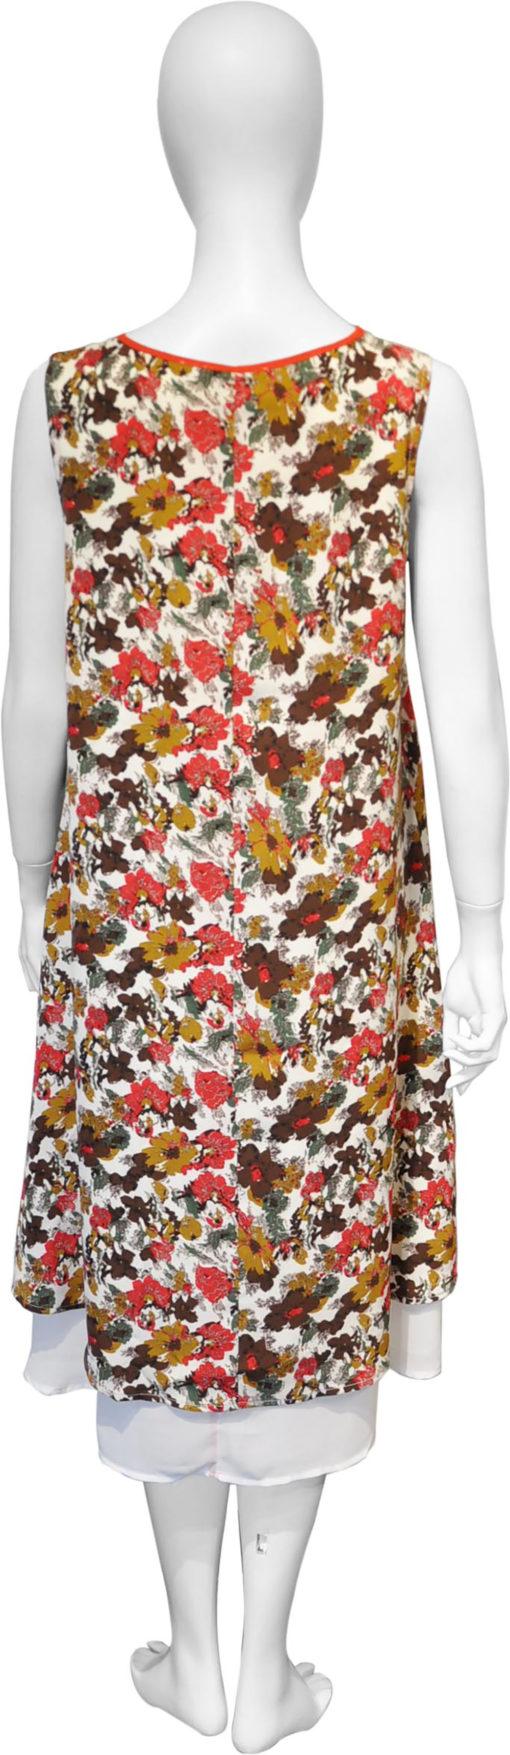 floral printed red dress- back